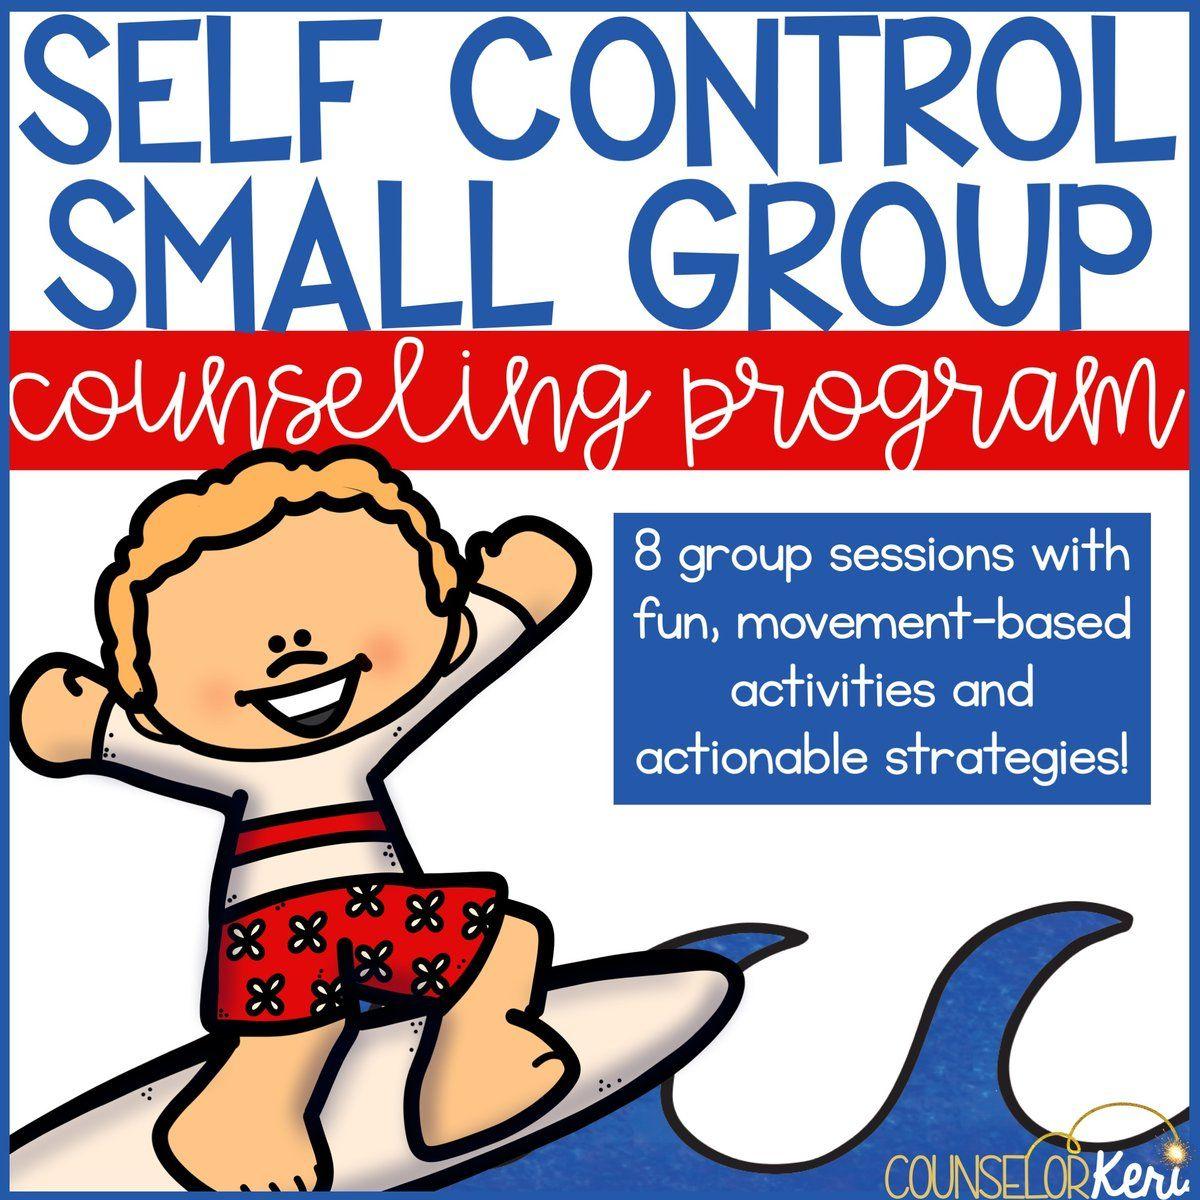 Self Control Group Counseling Program Impulse Control